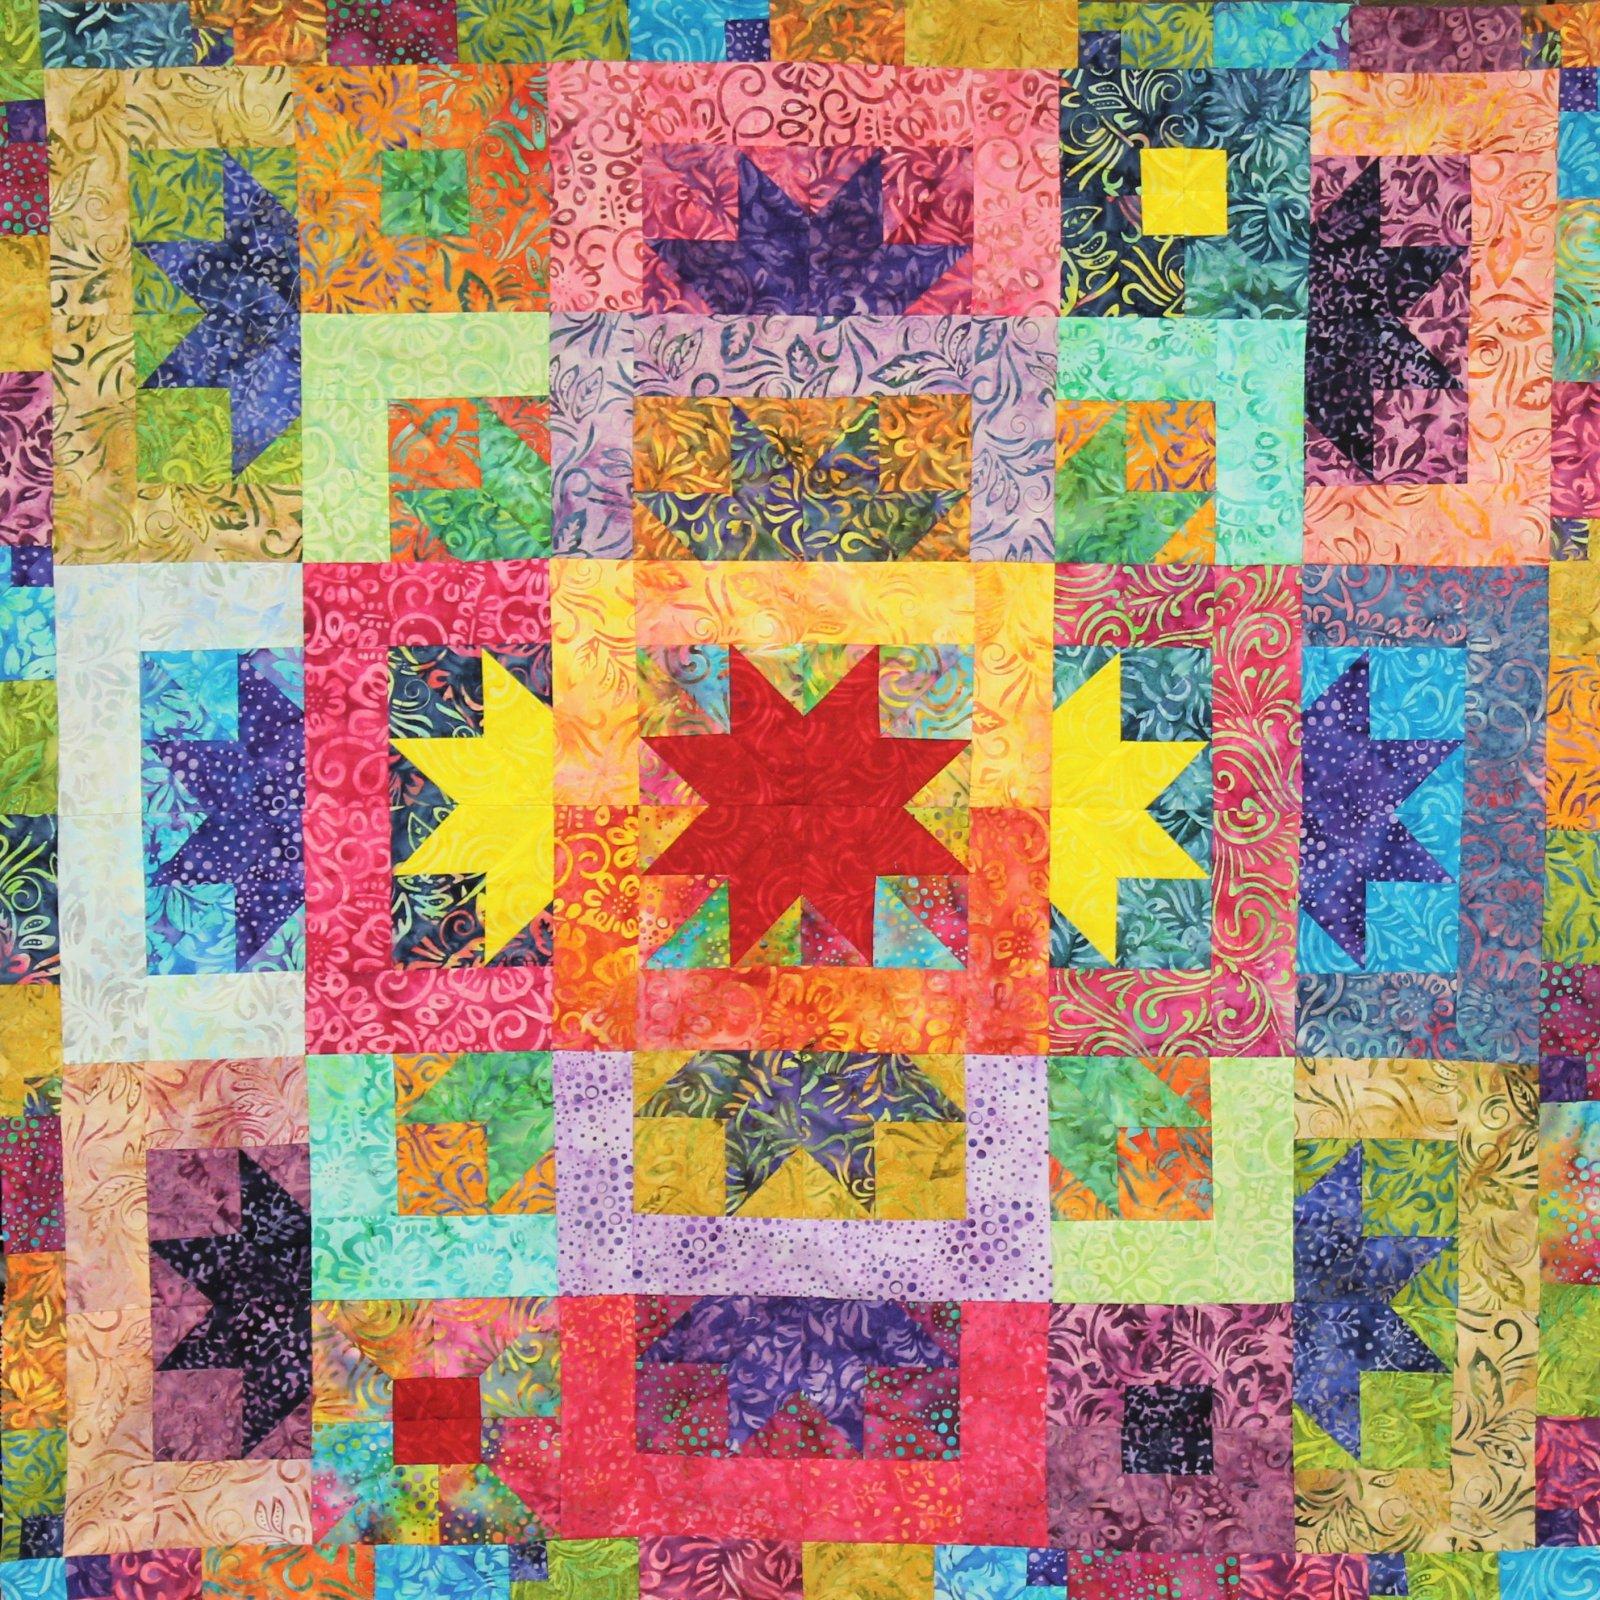 Quilter's Clinic Shop Hop Quilt Pattern 2020